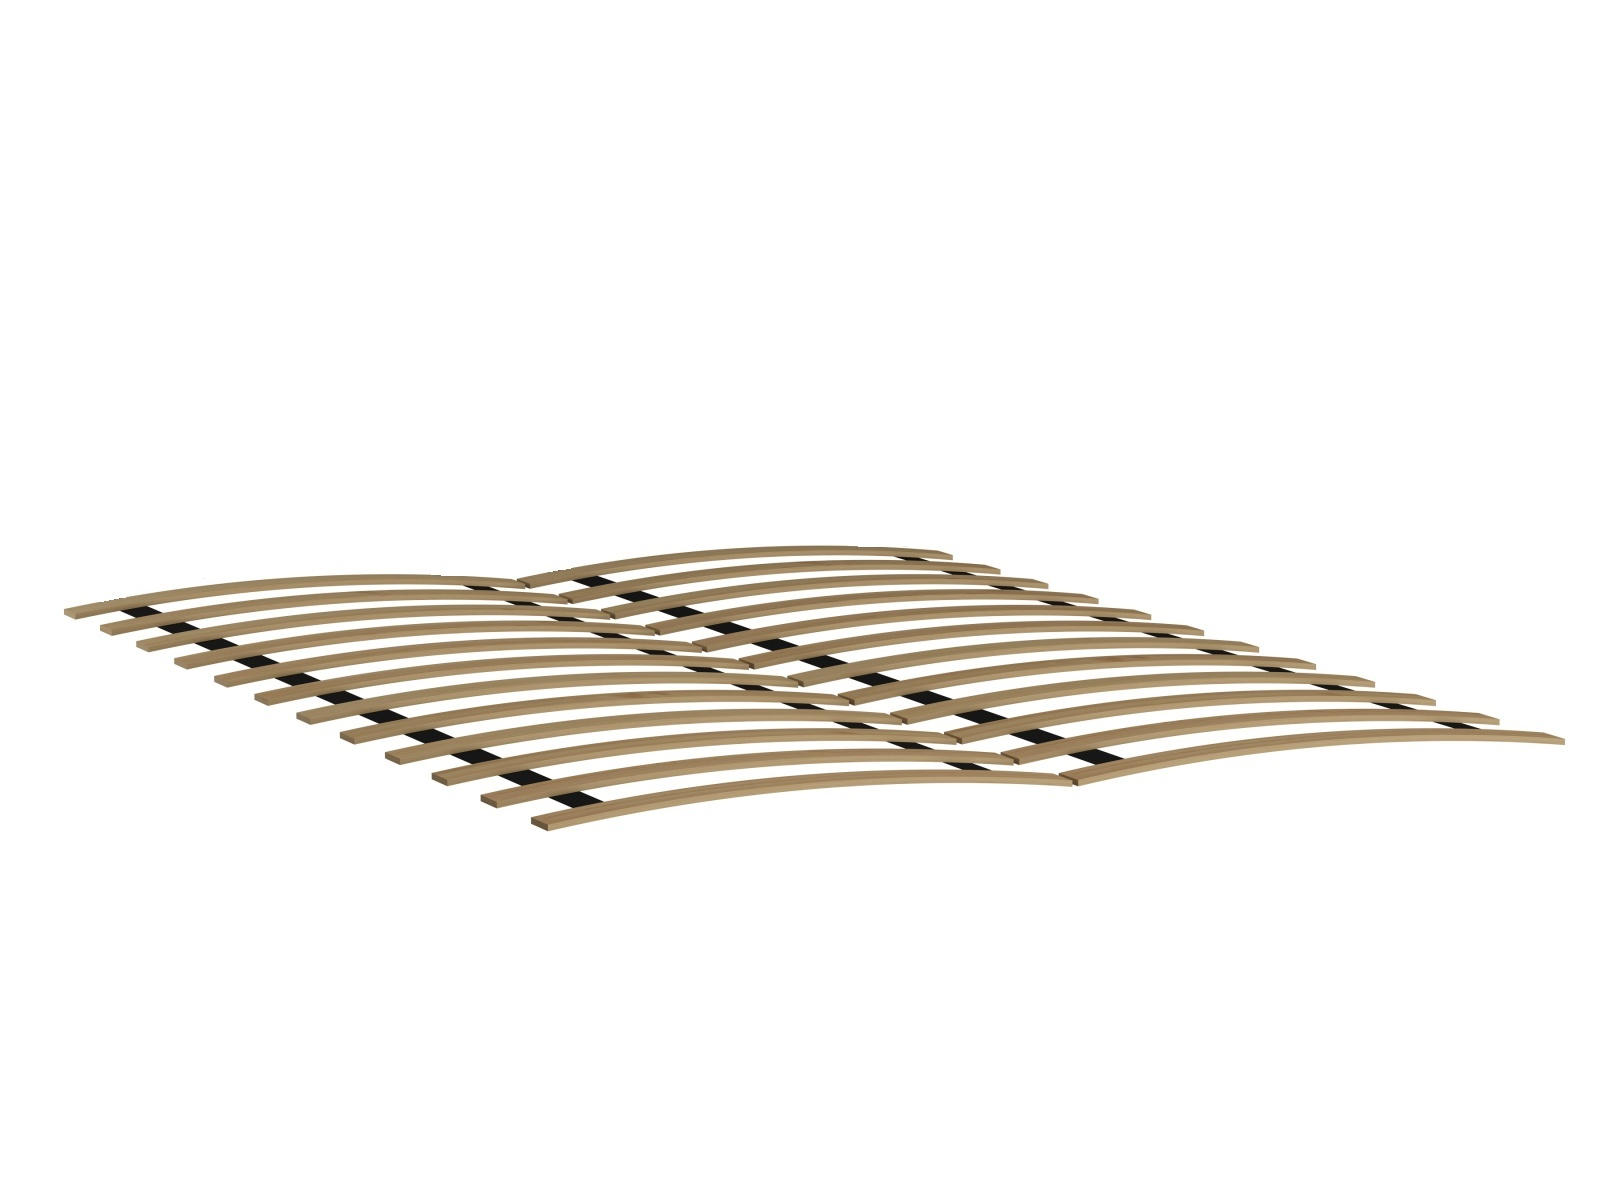 MAGNAT Rošt 160x200 cm, lamelový